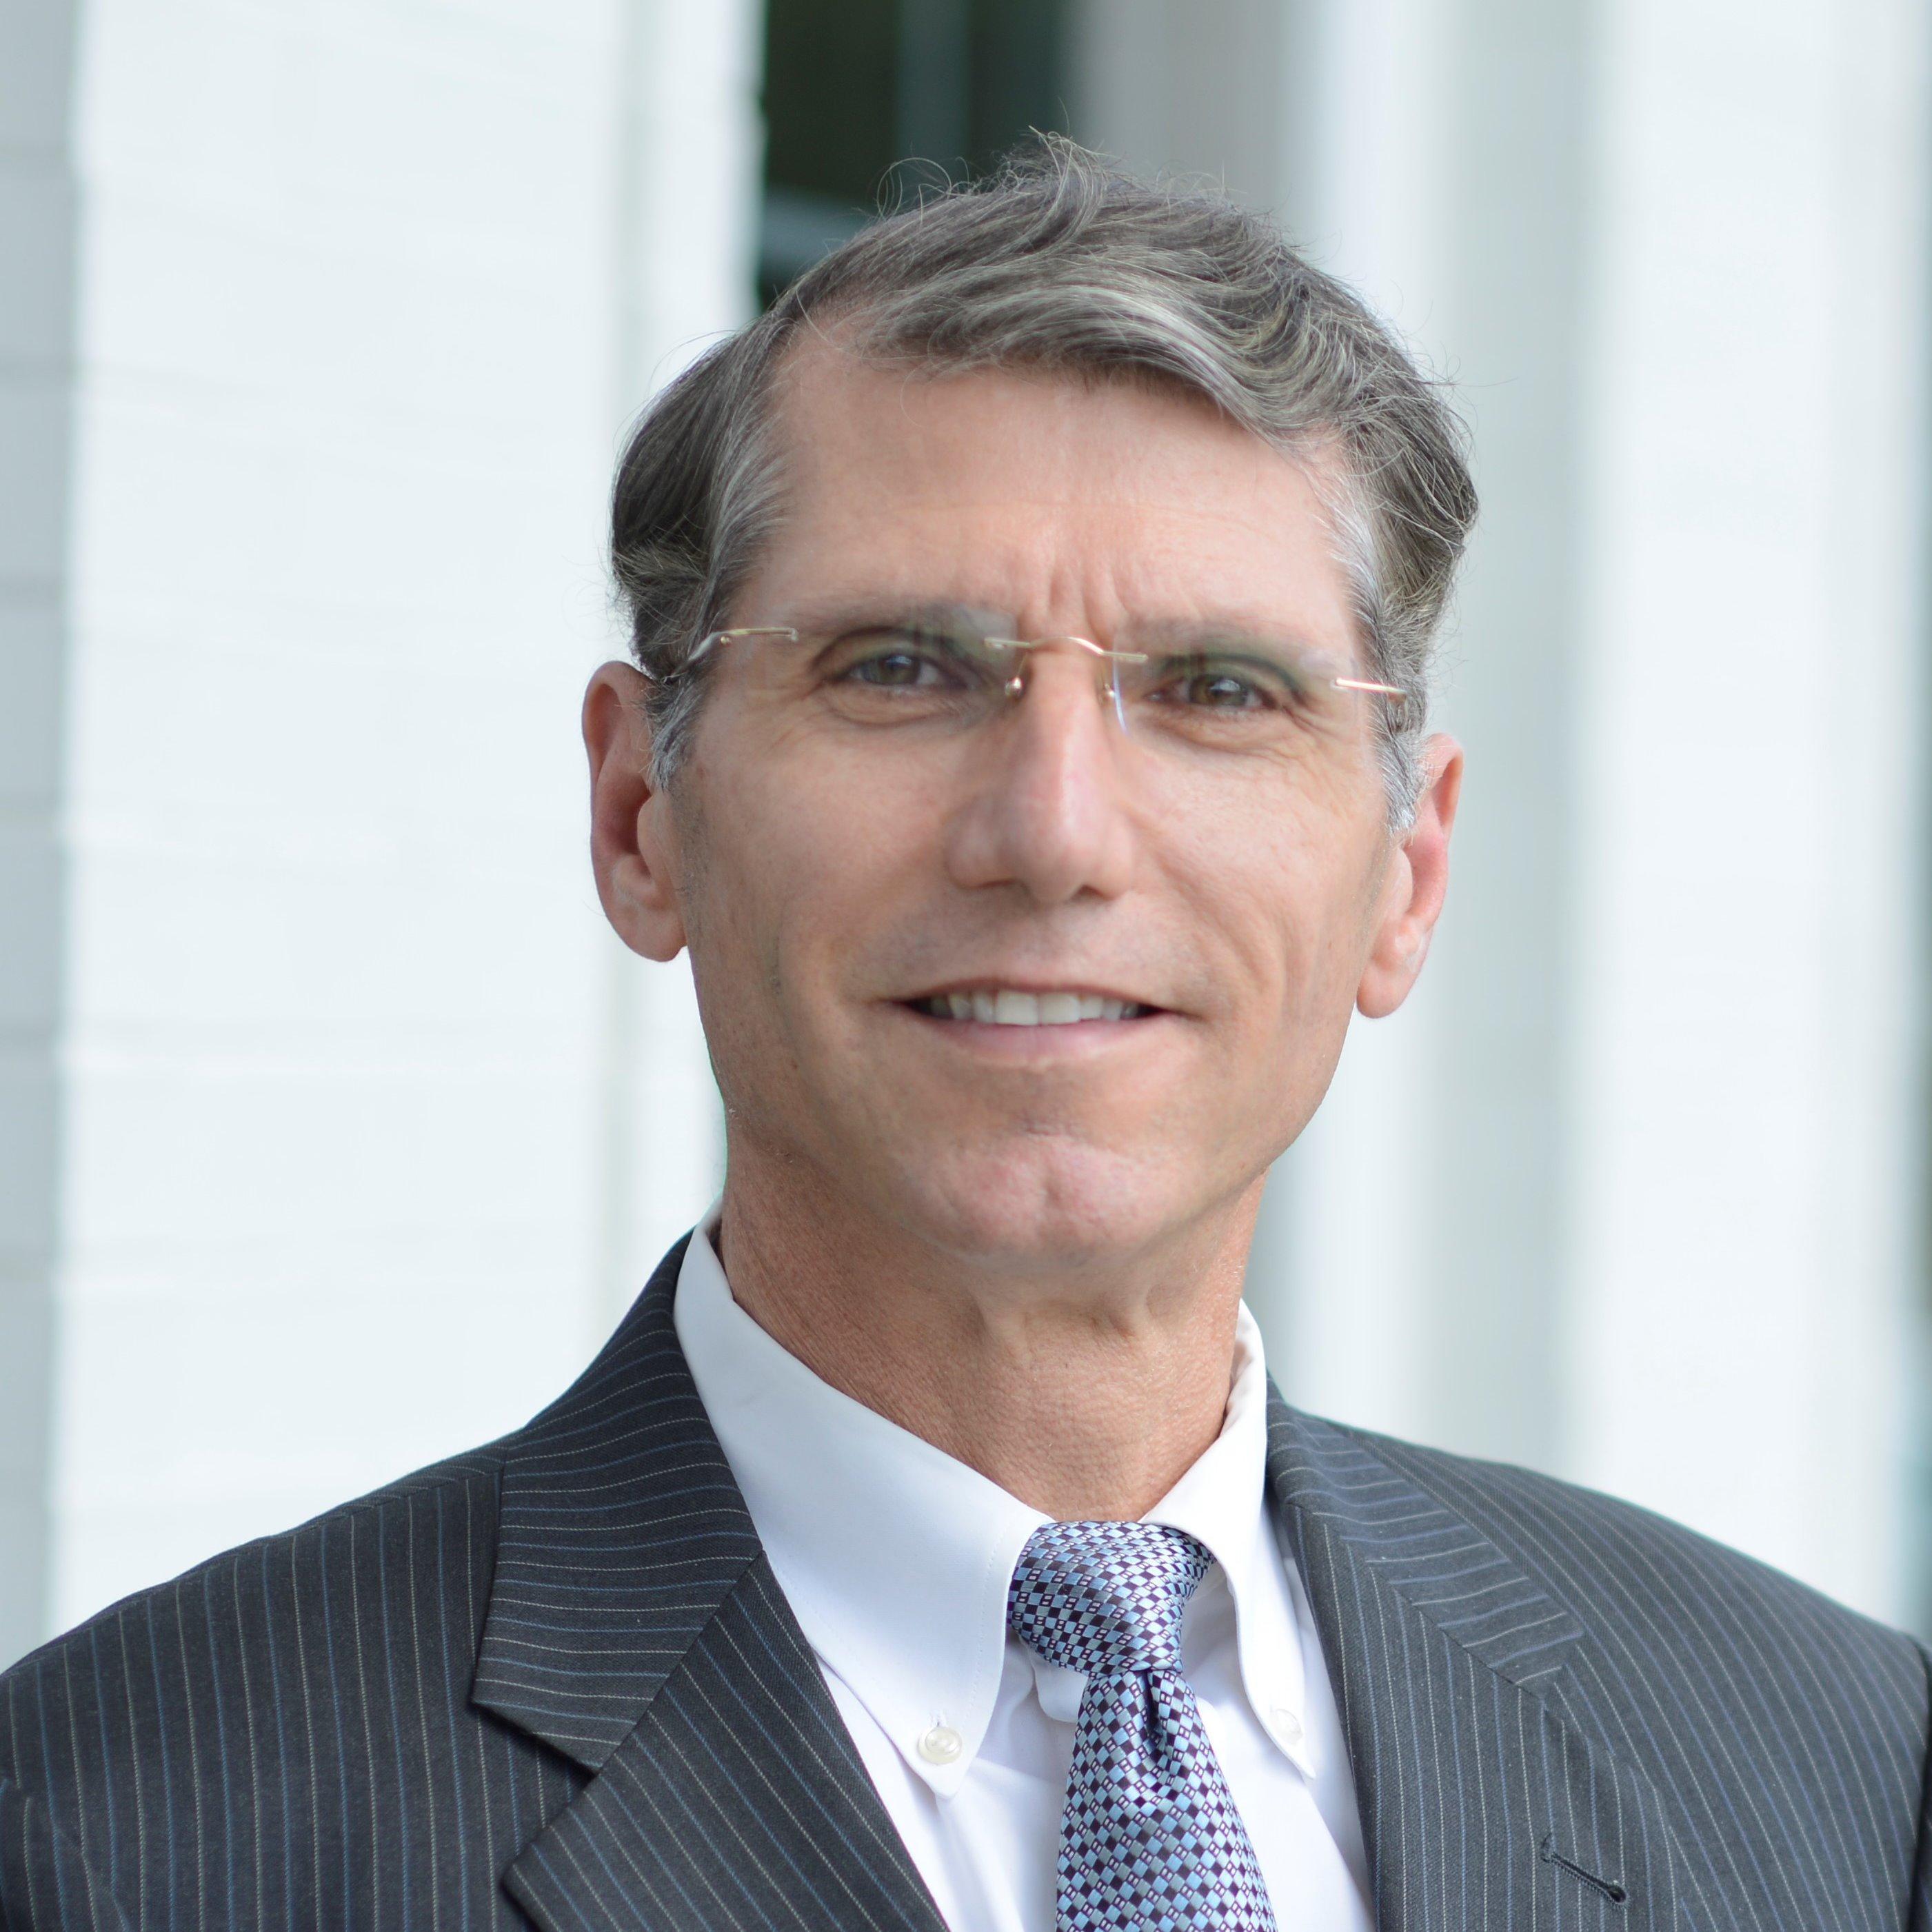 Robinette Legal Group, PLLC - Morgantown, WV - Attorneys